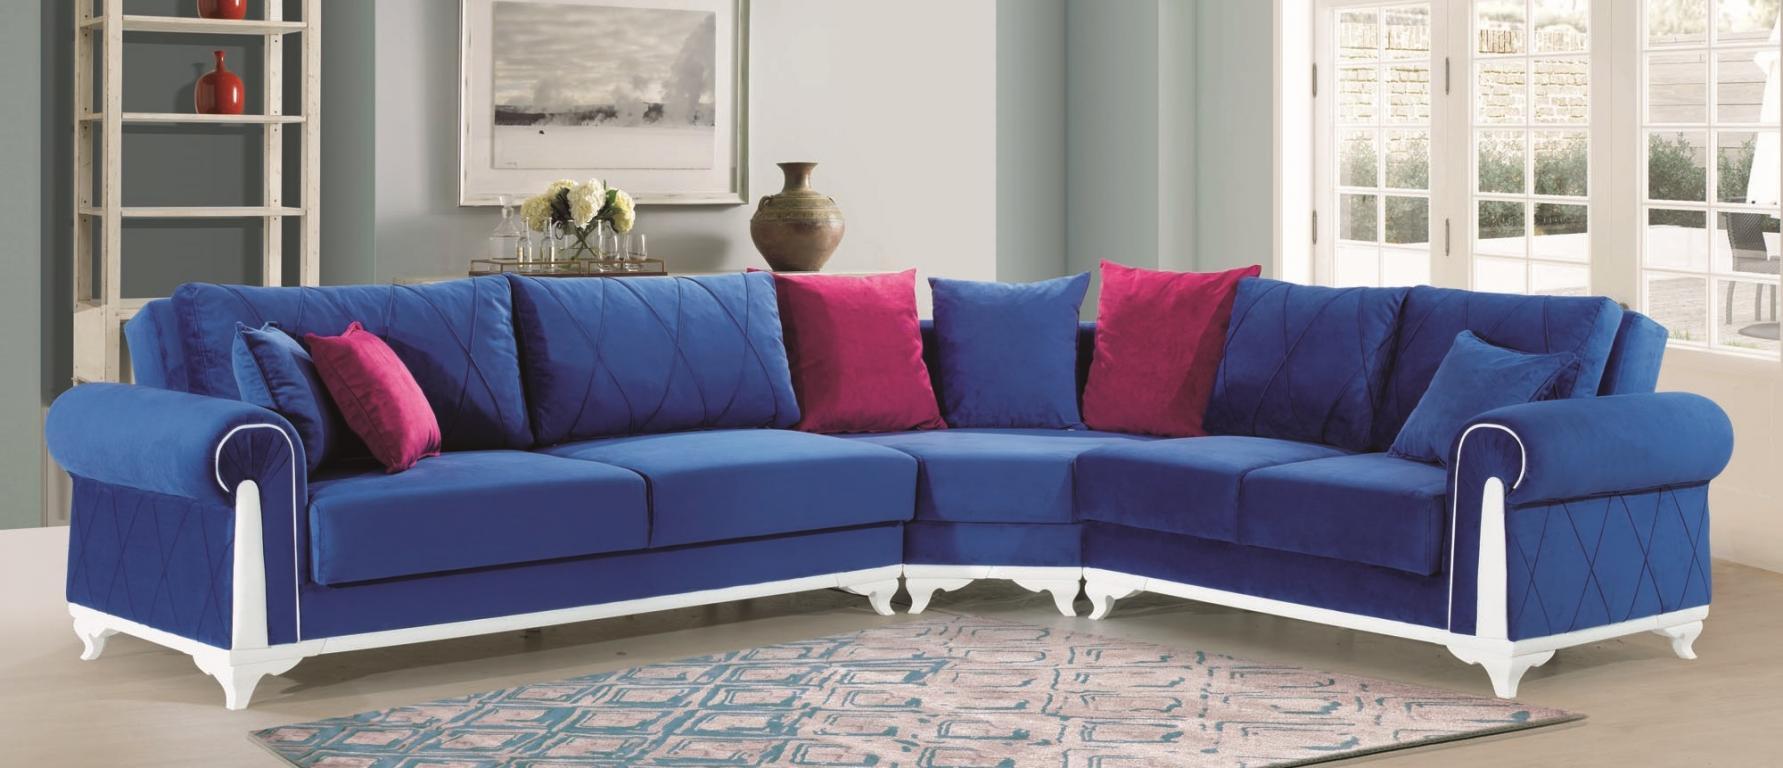 ottova sitzecke 3 l 2 yuvam m belhaus in wuppertal cilek offizieller h ndler in europa. Black Bedroom Furniture Sets. Home Design Ideas